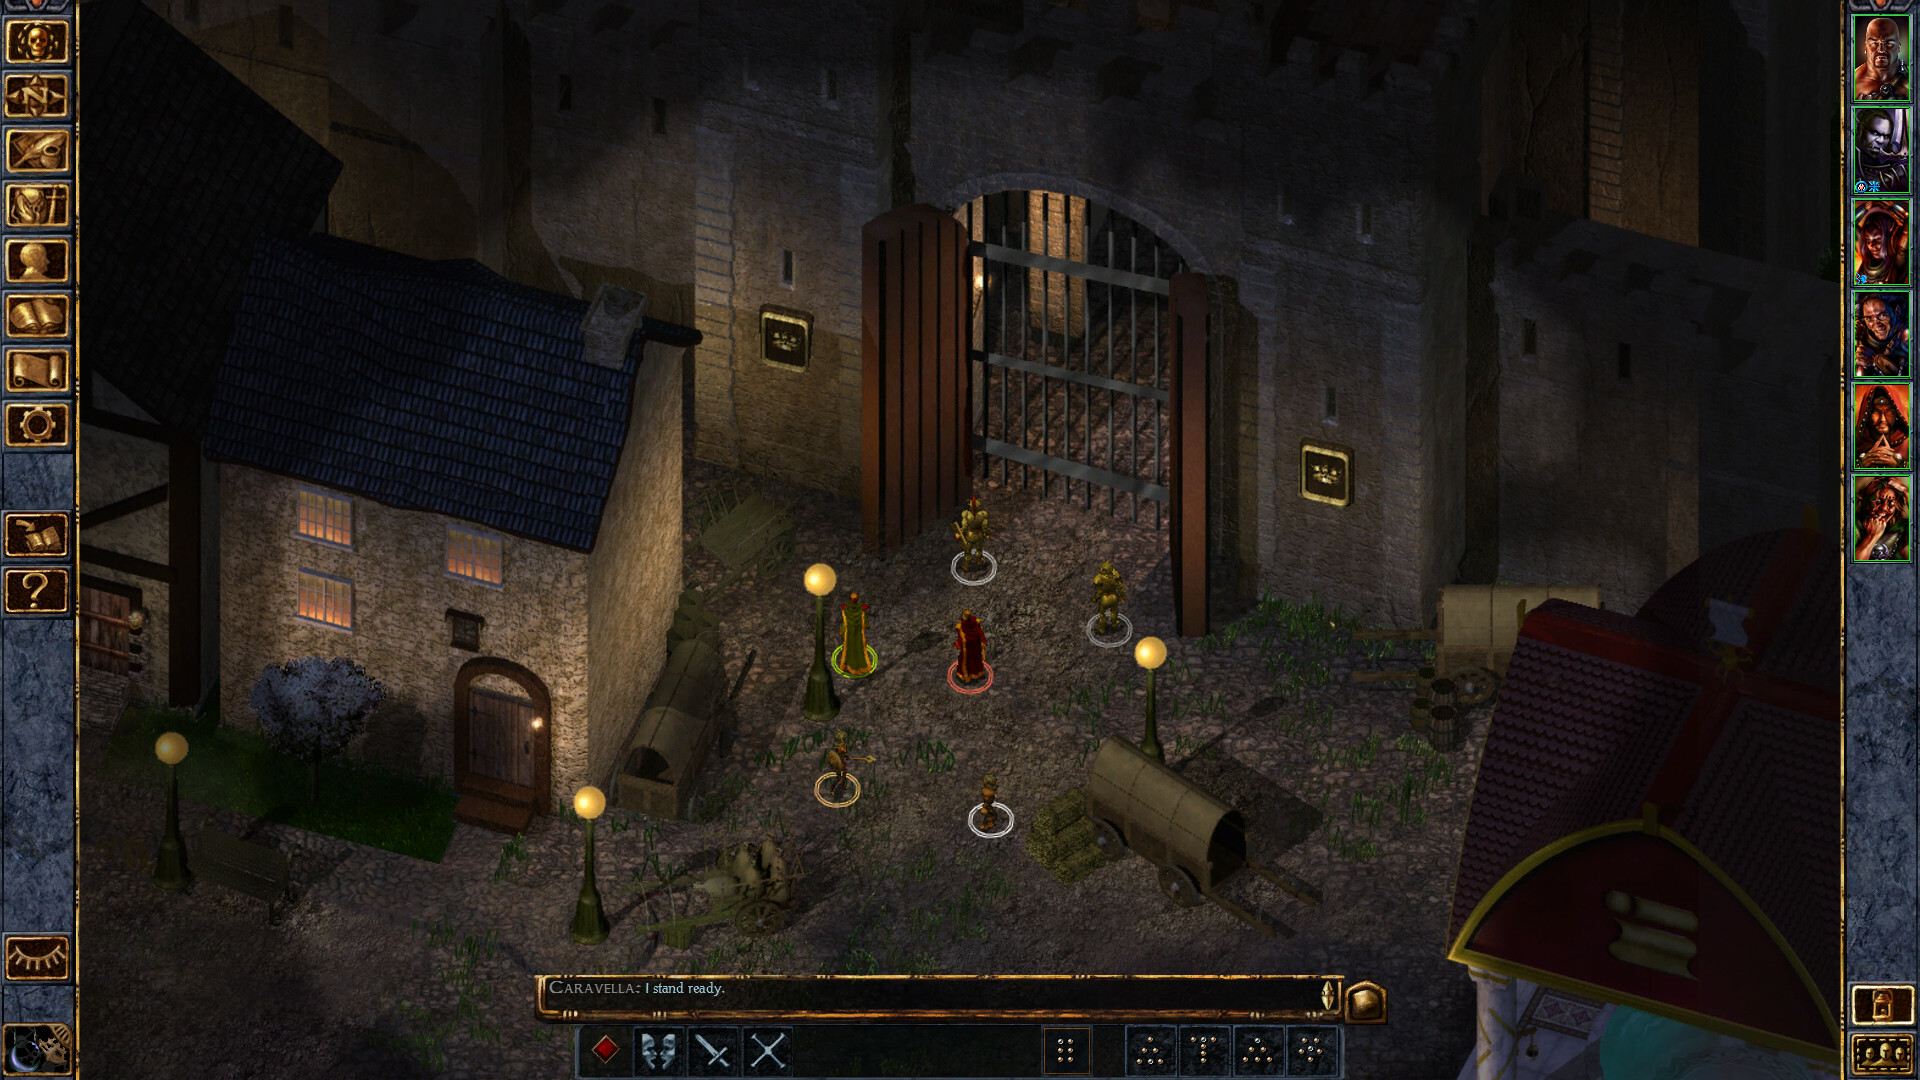 baldurs-gate-enhanced-edition-pc-screenshot-1